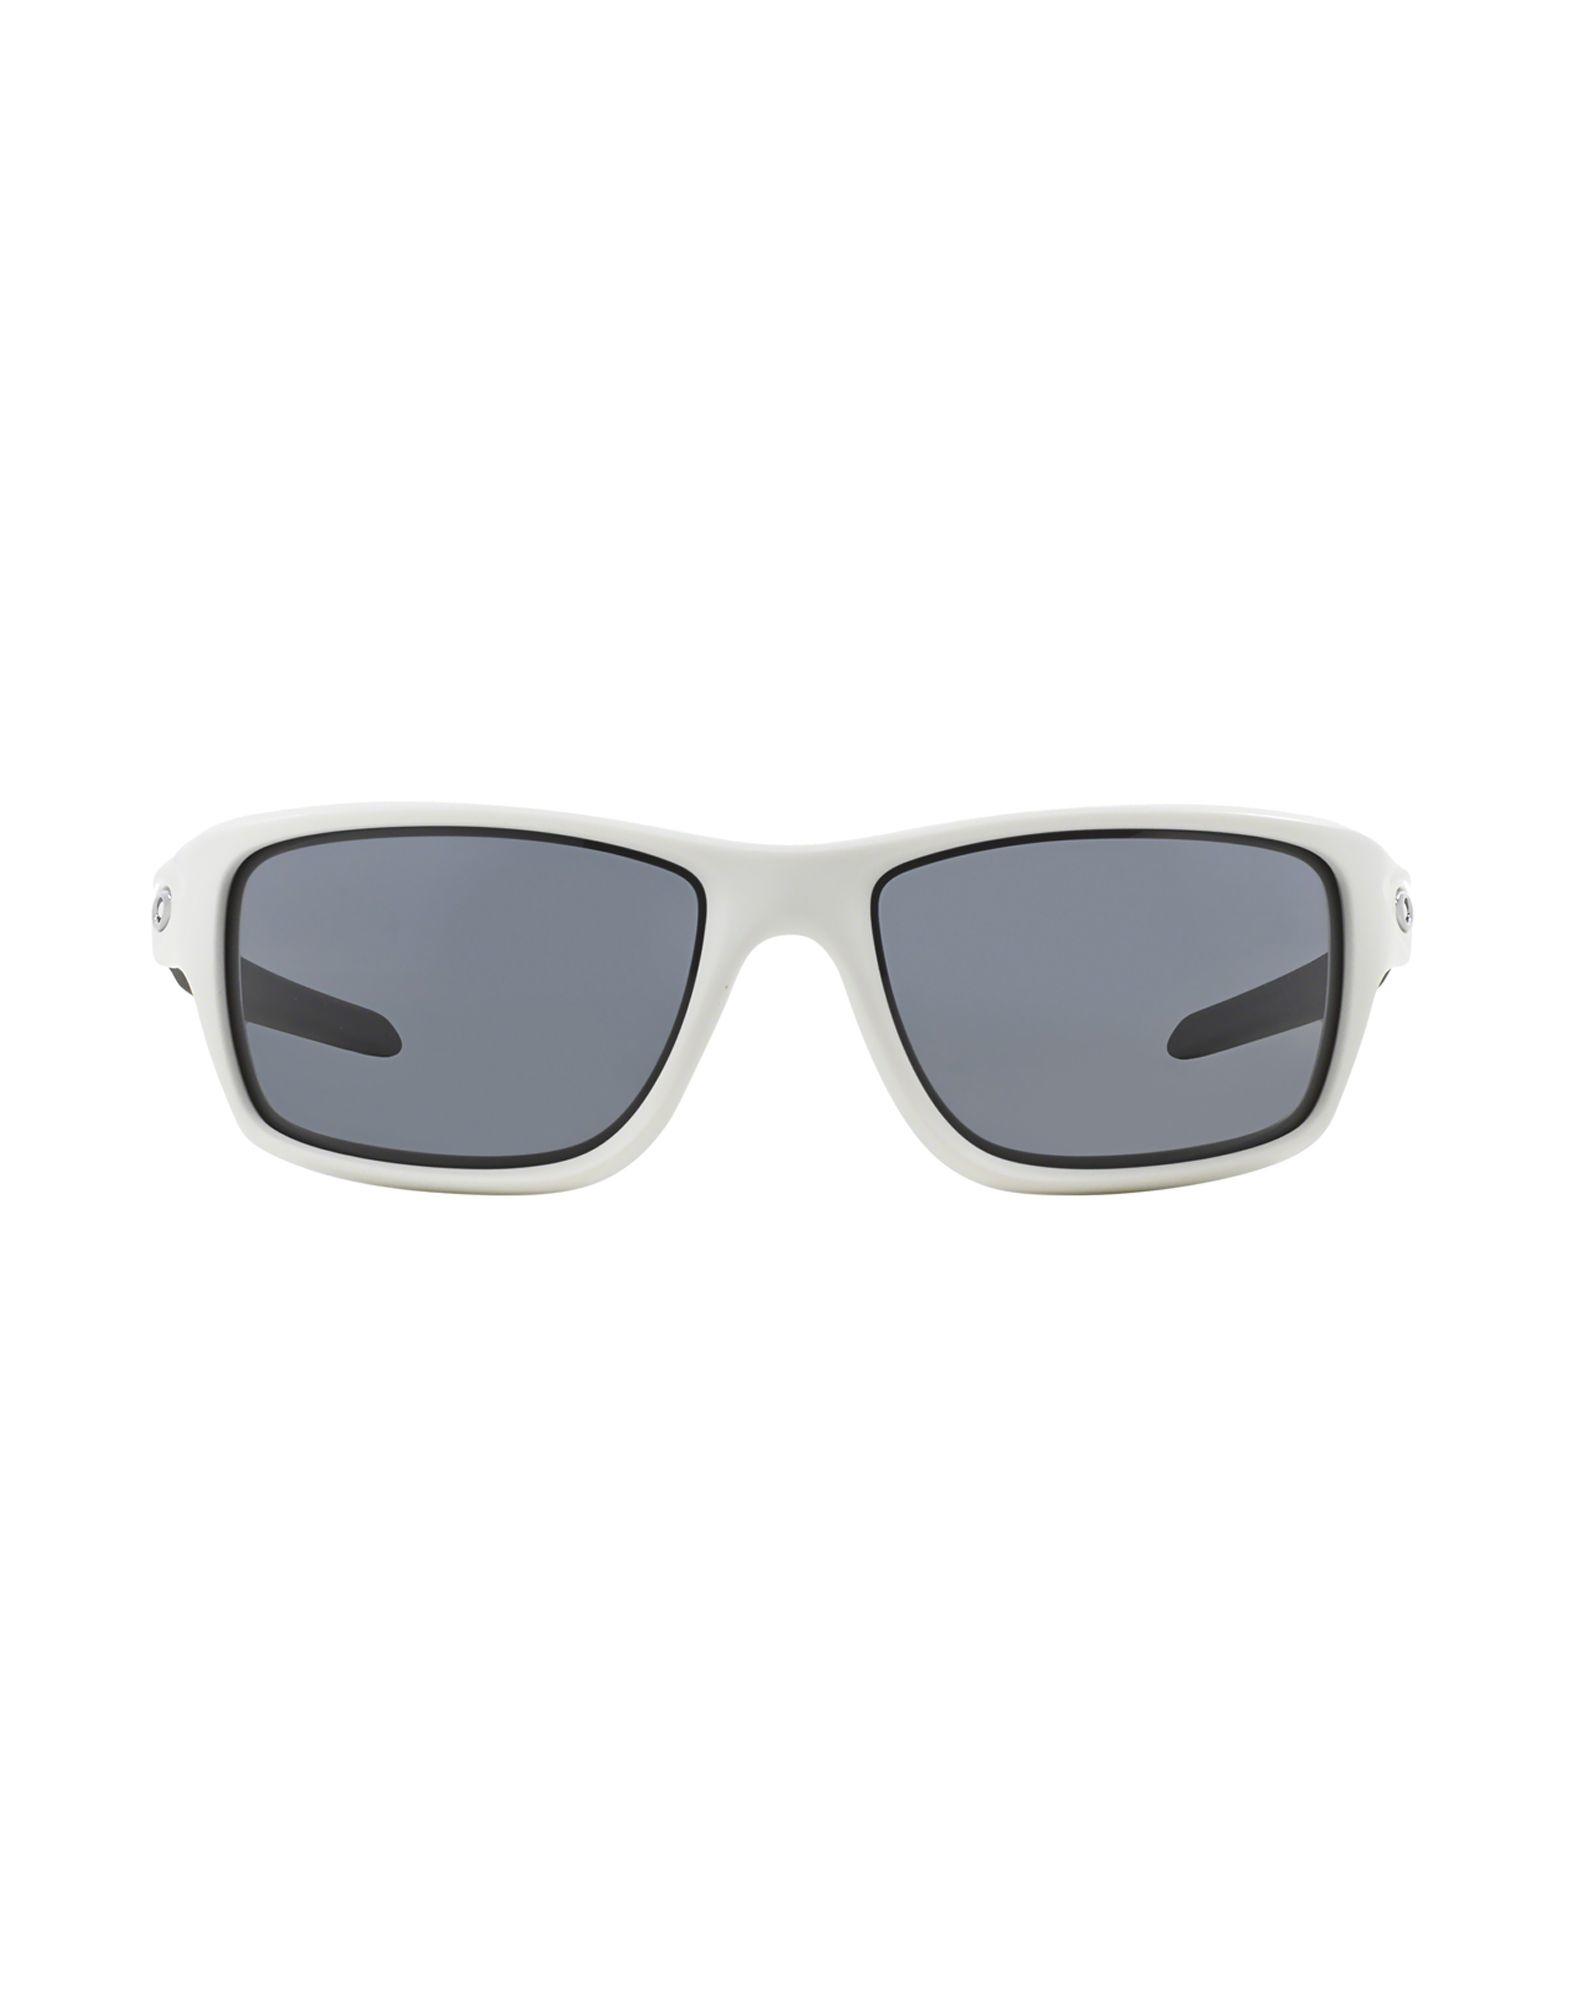 Oakley Blue And White Sunglasses | Louisiana Bucket Brigade